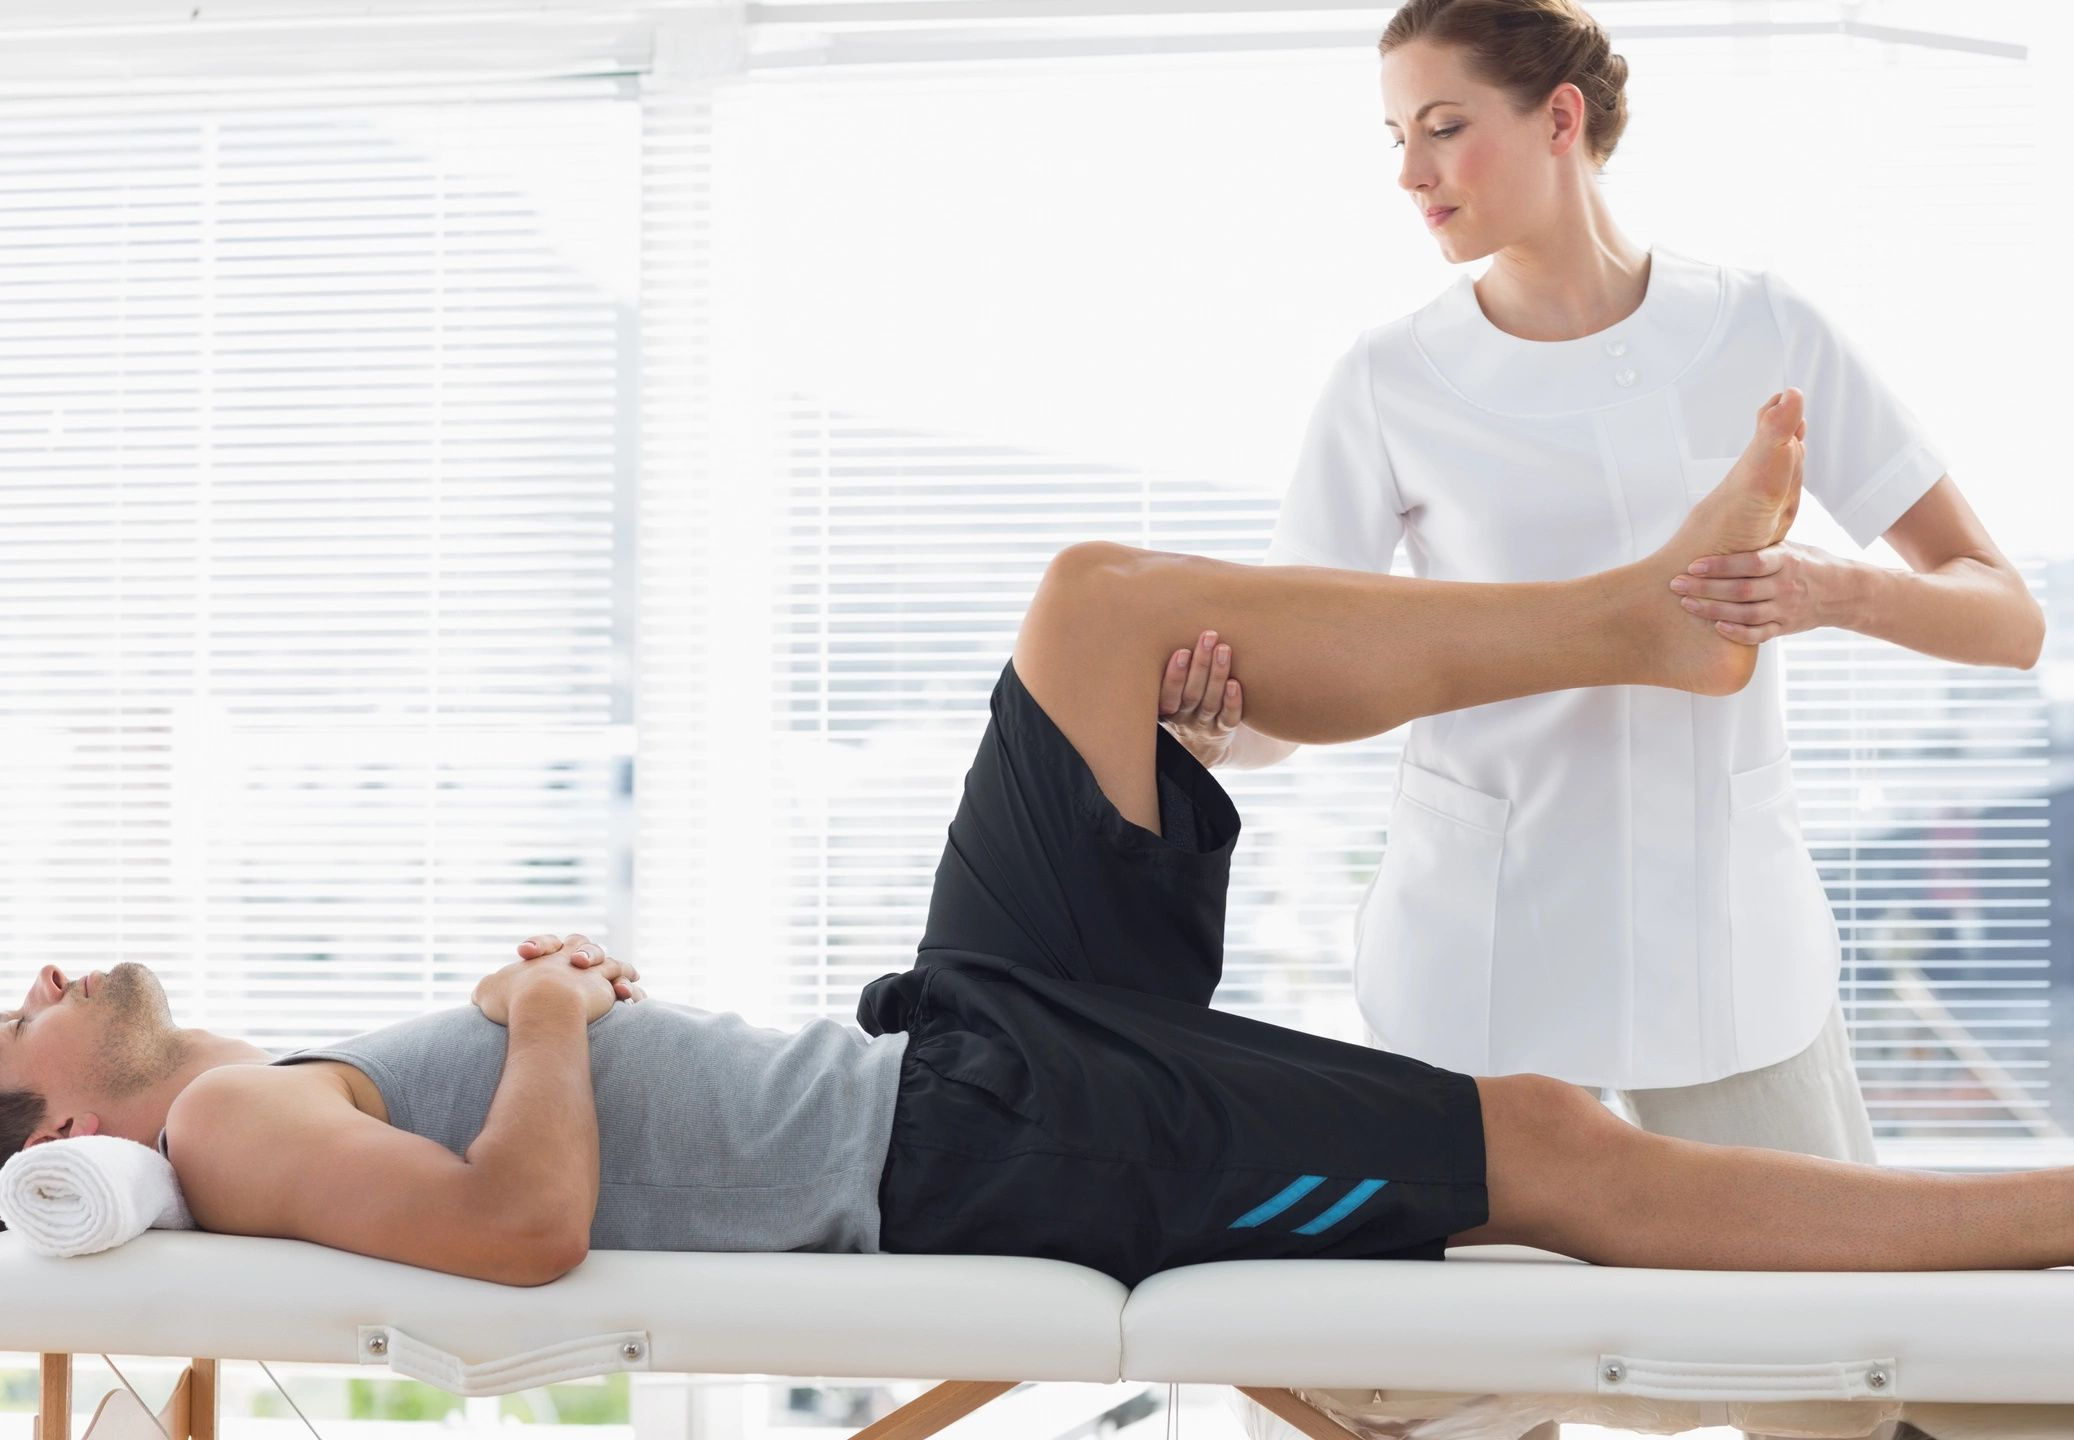 Sports Medicine Research